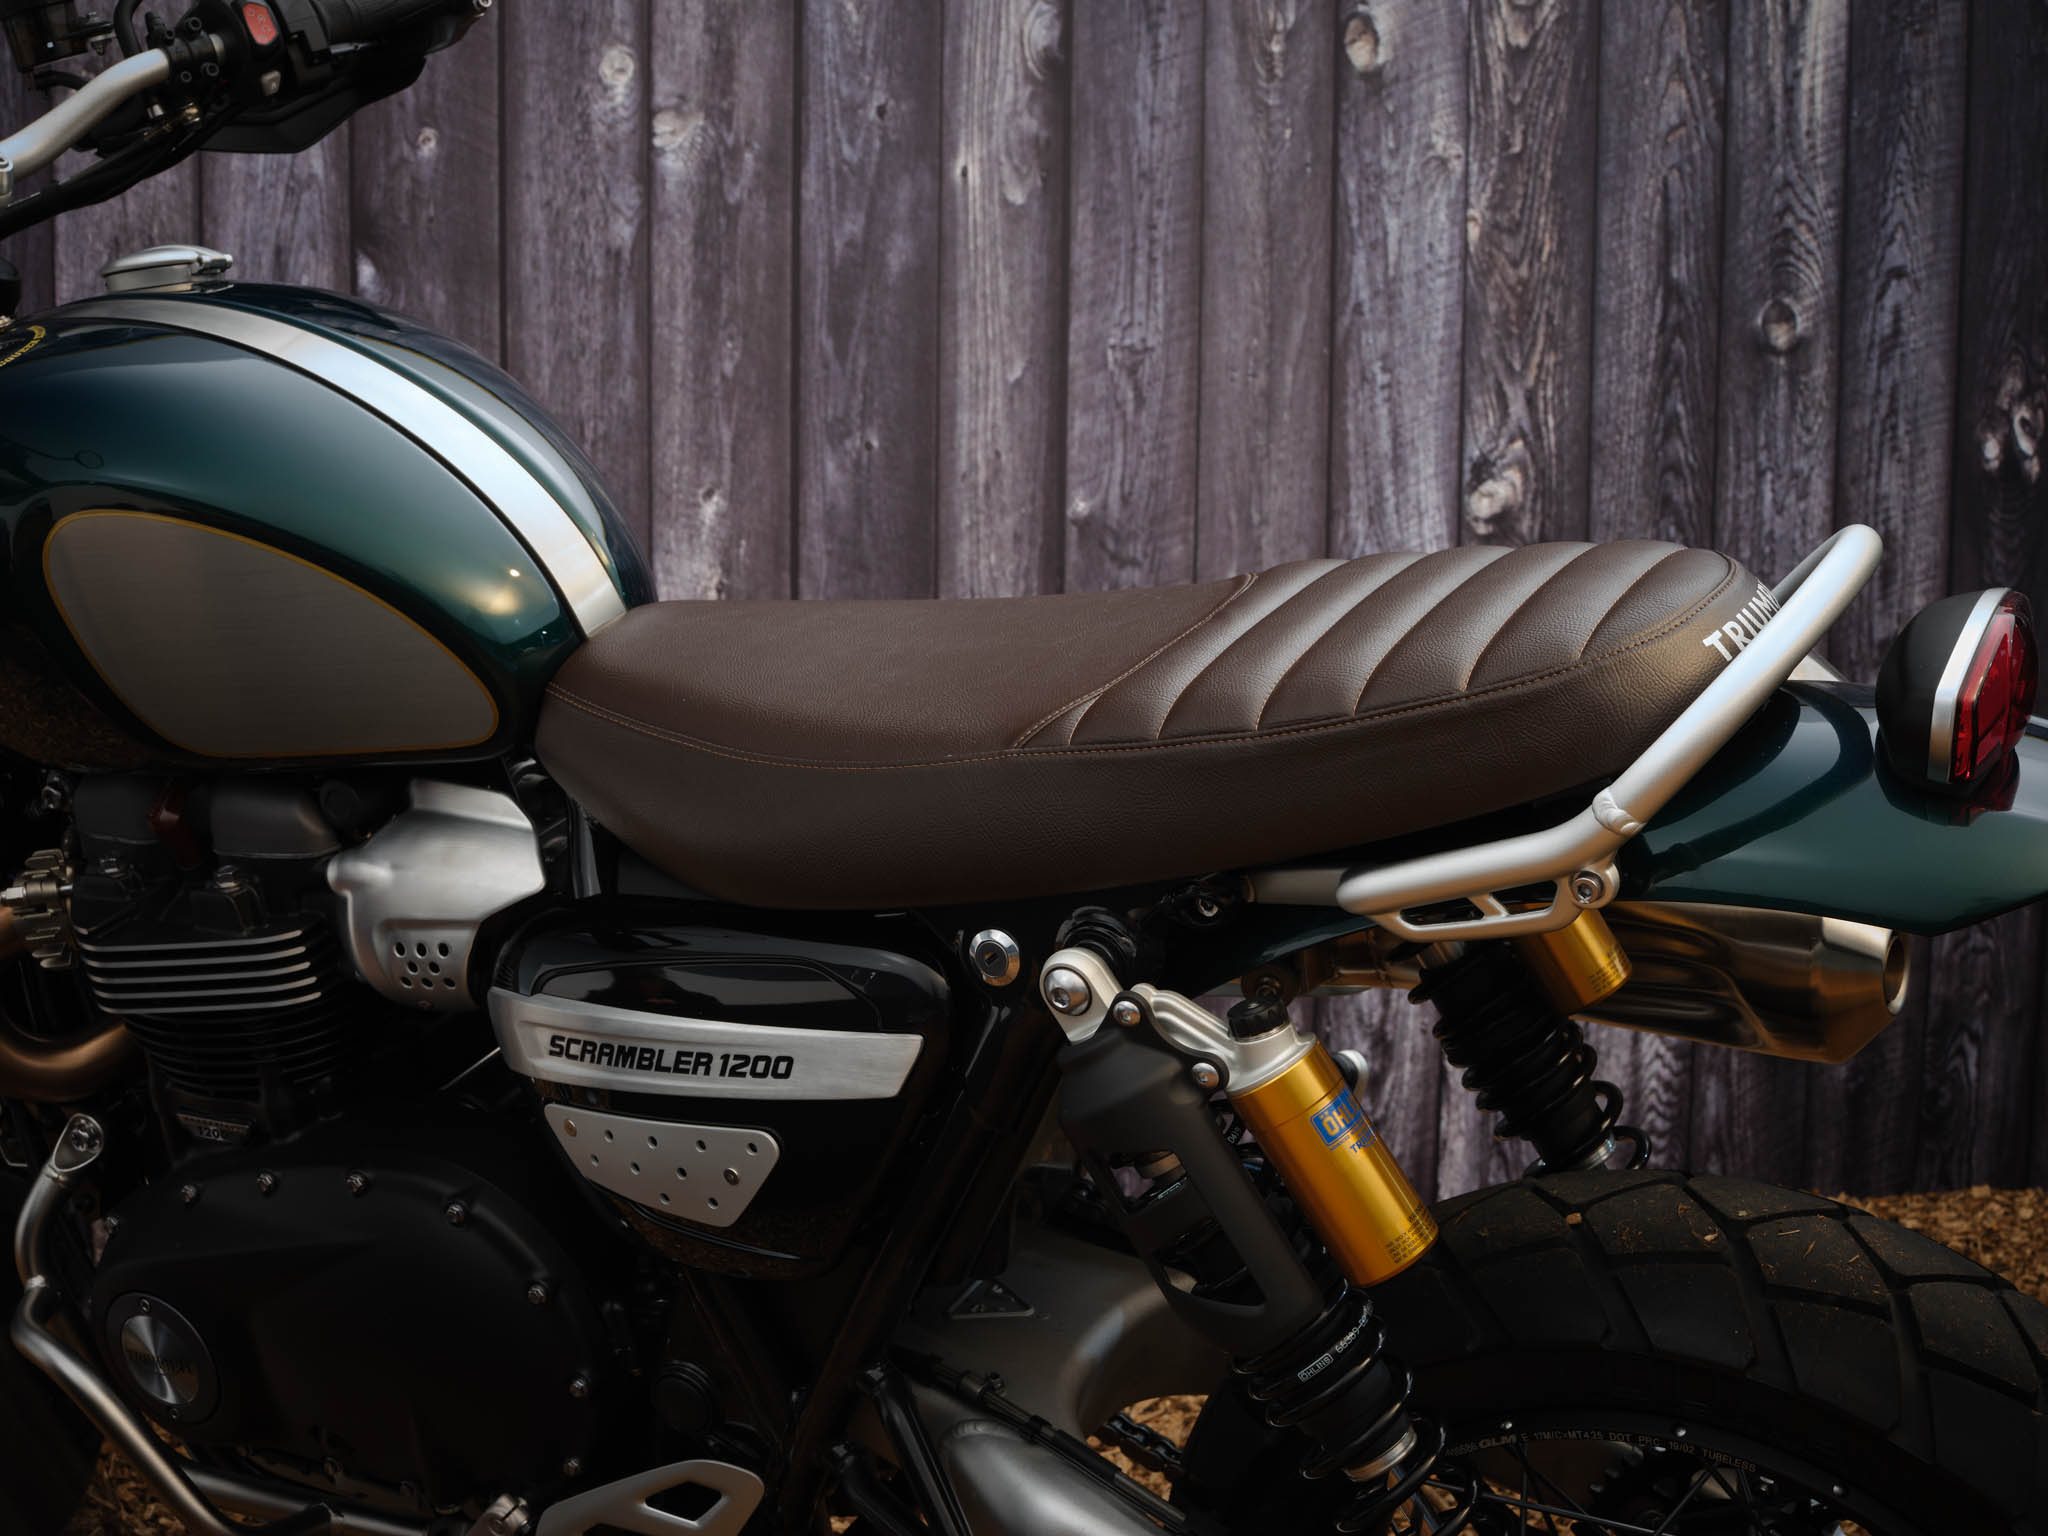 Triumph_Scrambler_1200_Steve_McQueen_Details_2021-3